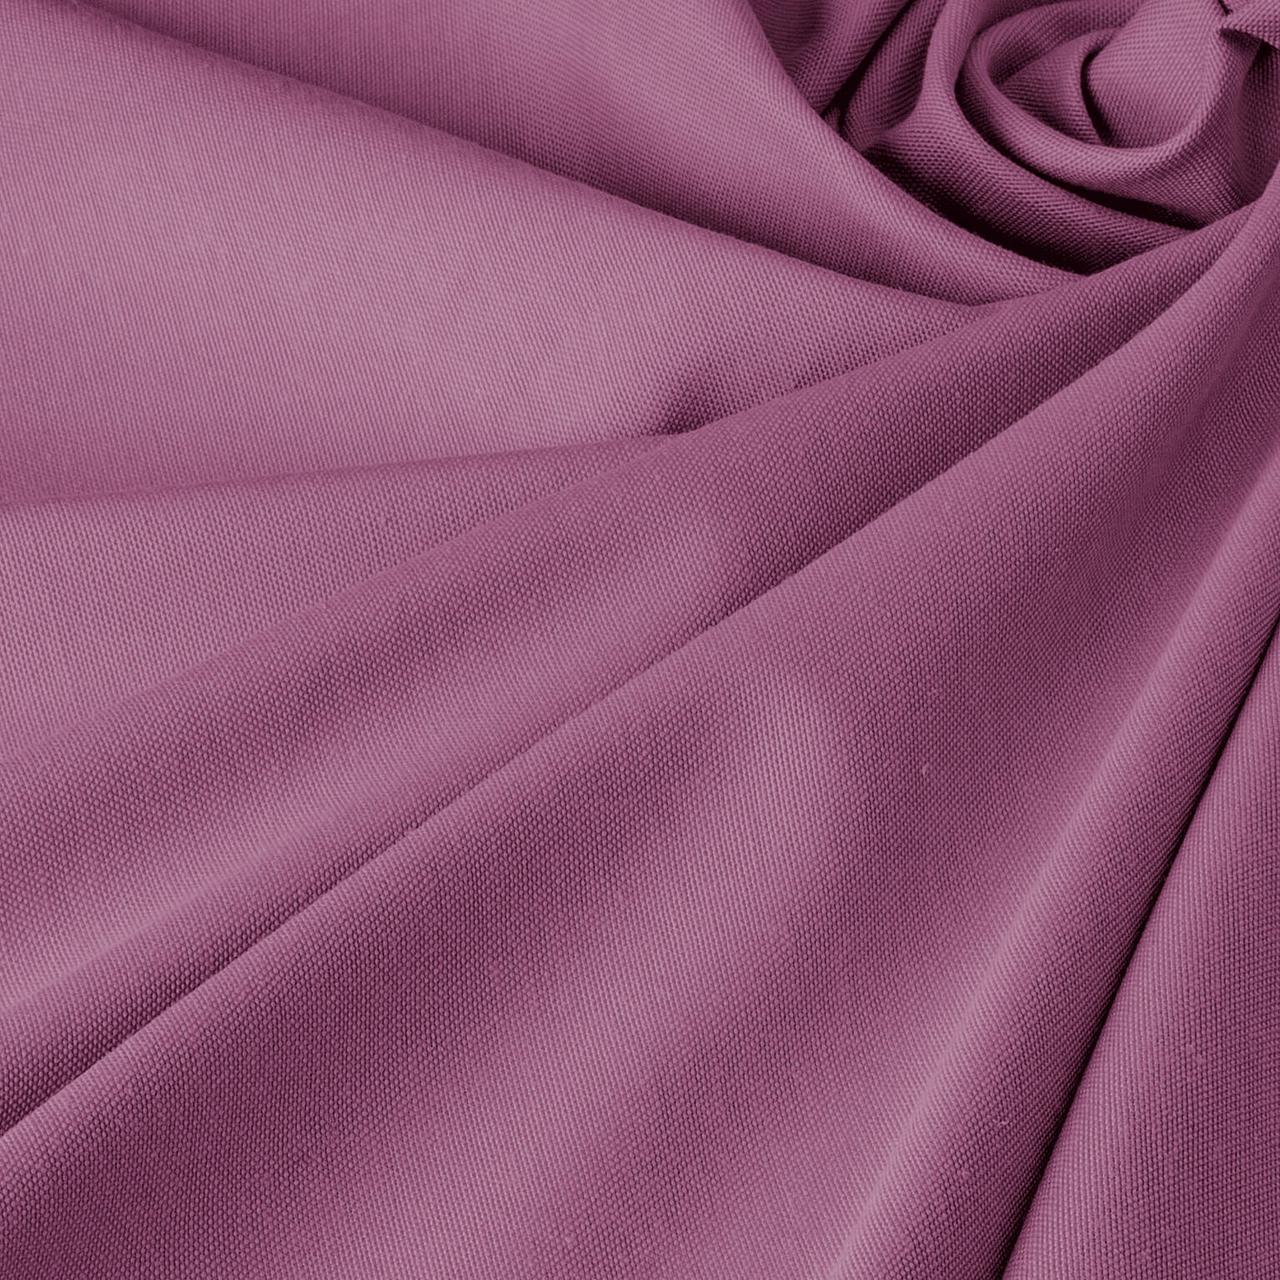 Портьерная ткань для штор DRK-7308